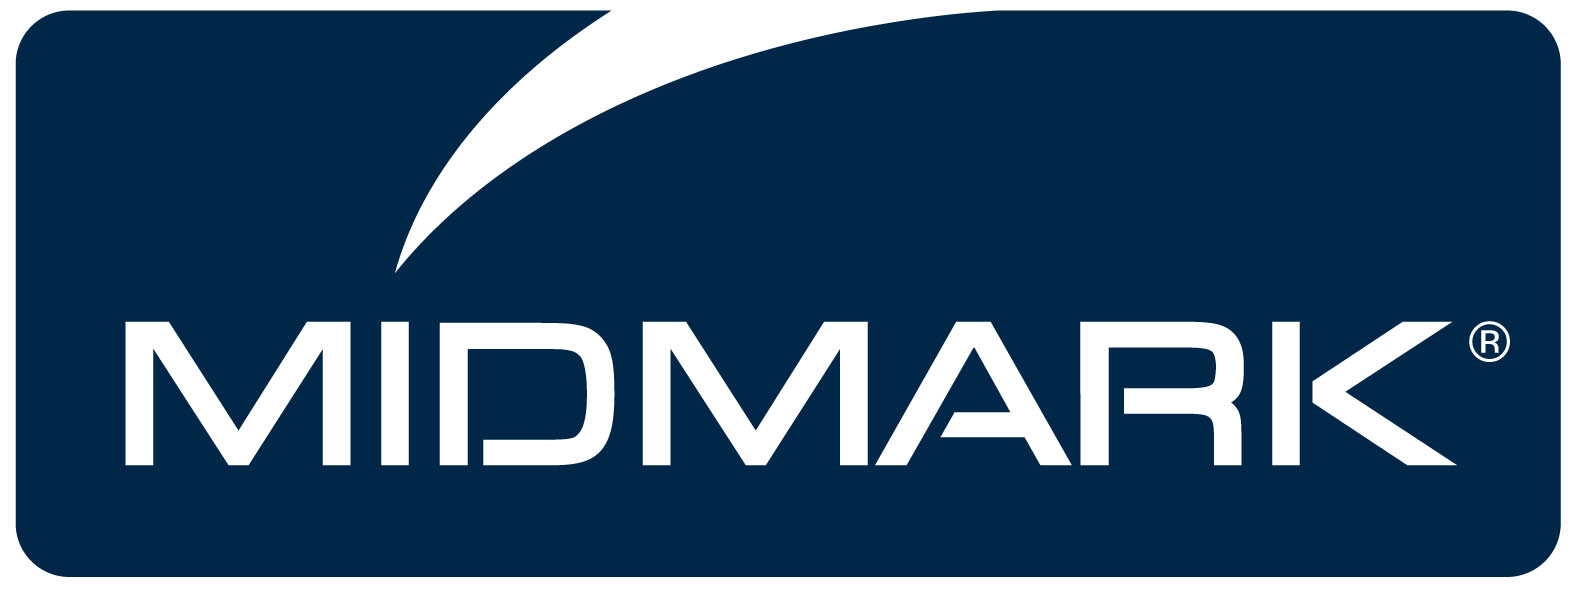 Midmark Logo